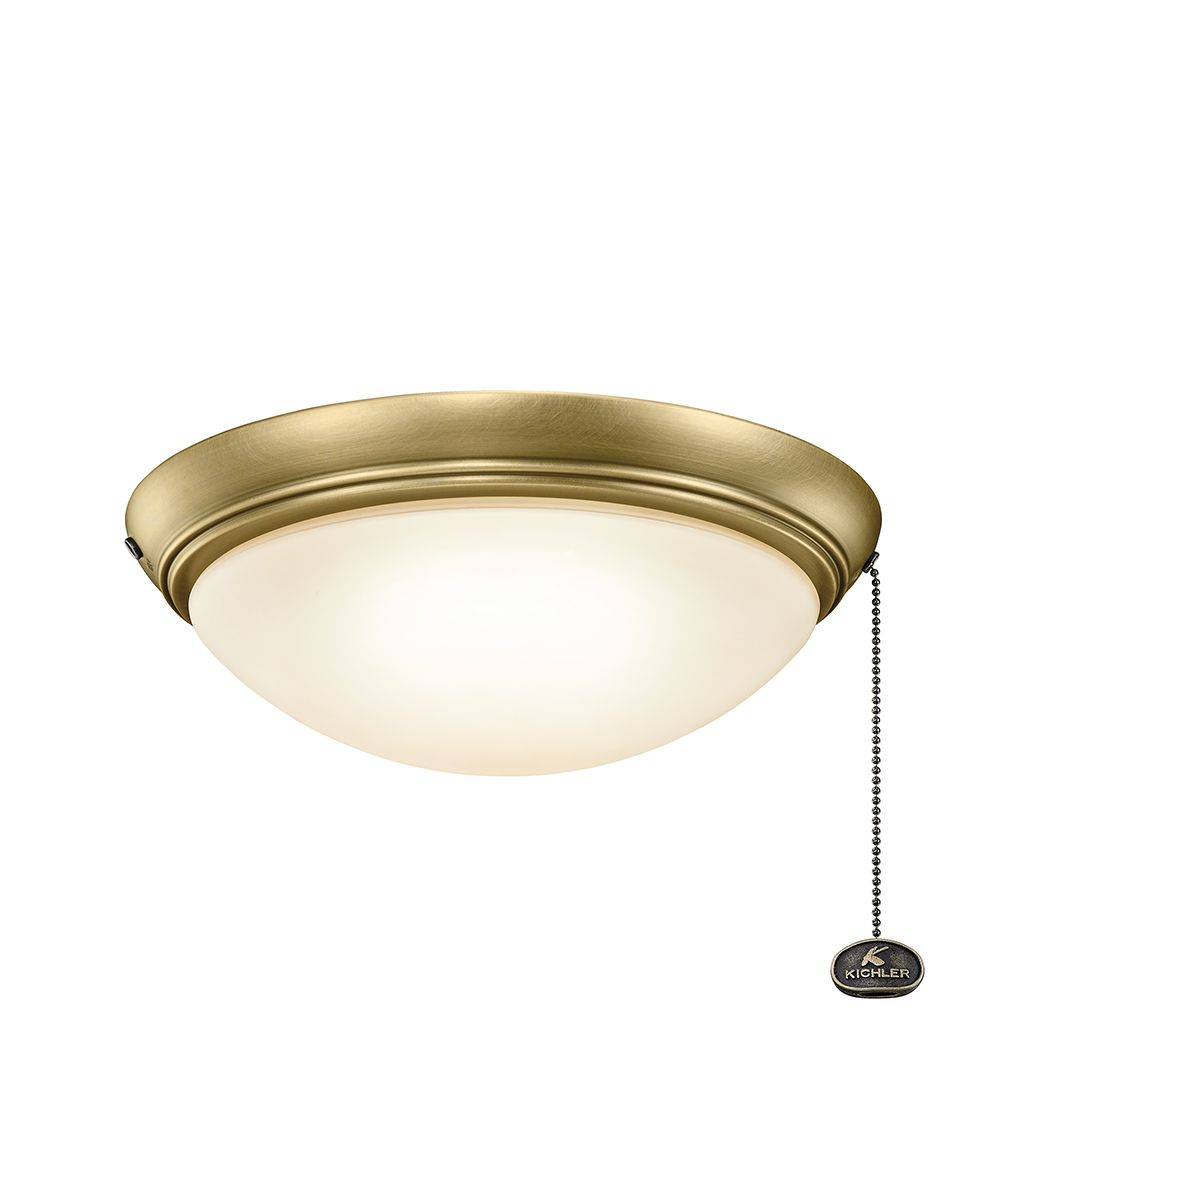 kichler accessories low profile led ceiling fan light kit in natural brass ceiling fan light. Black Bedroom Furniture Sets. Home Design Ideas